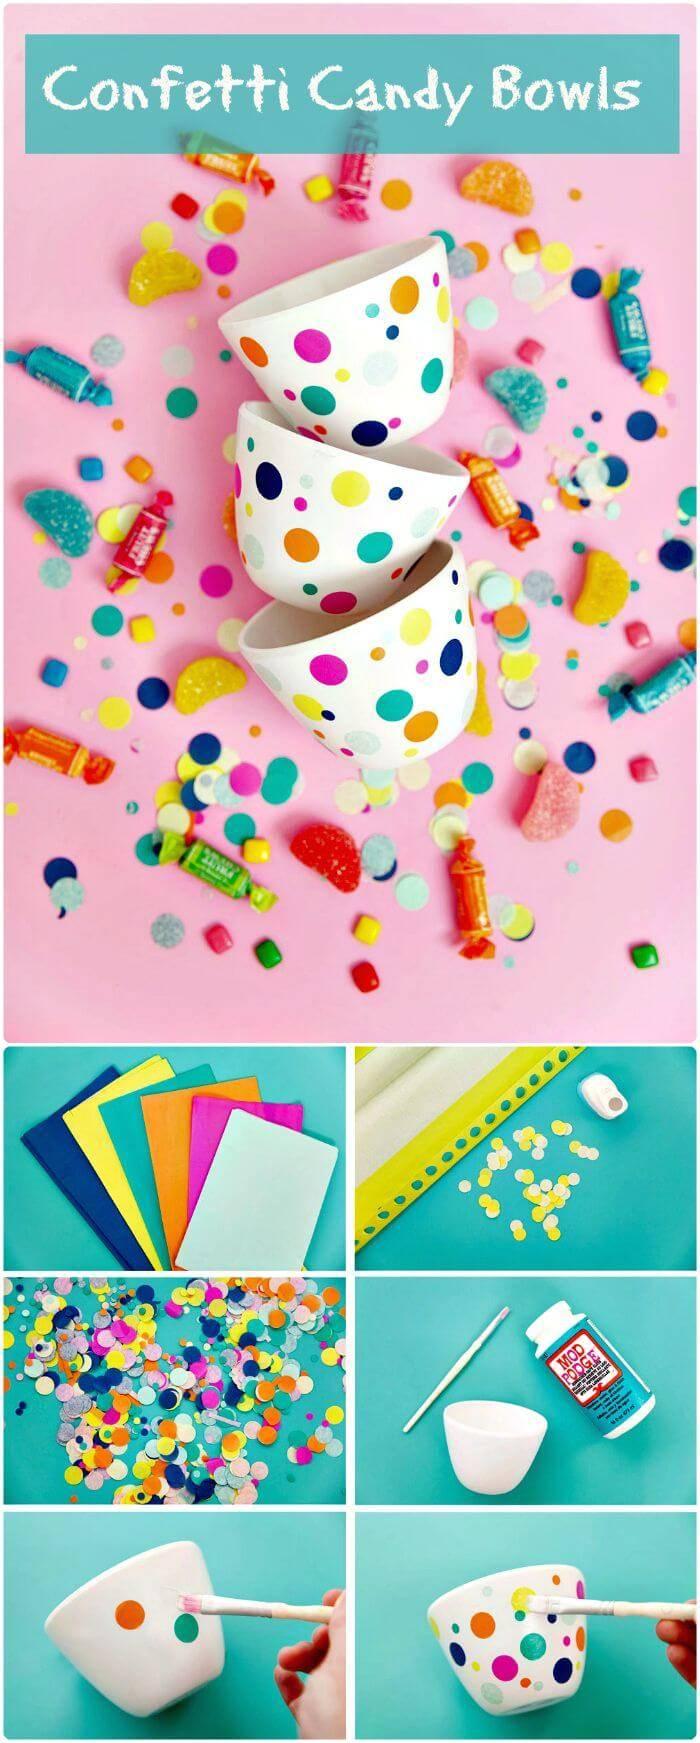 Confetti Candy Bowls